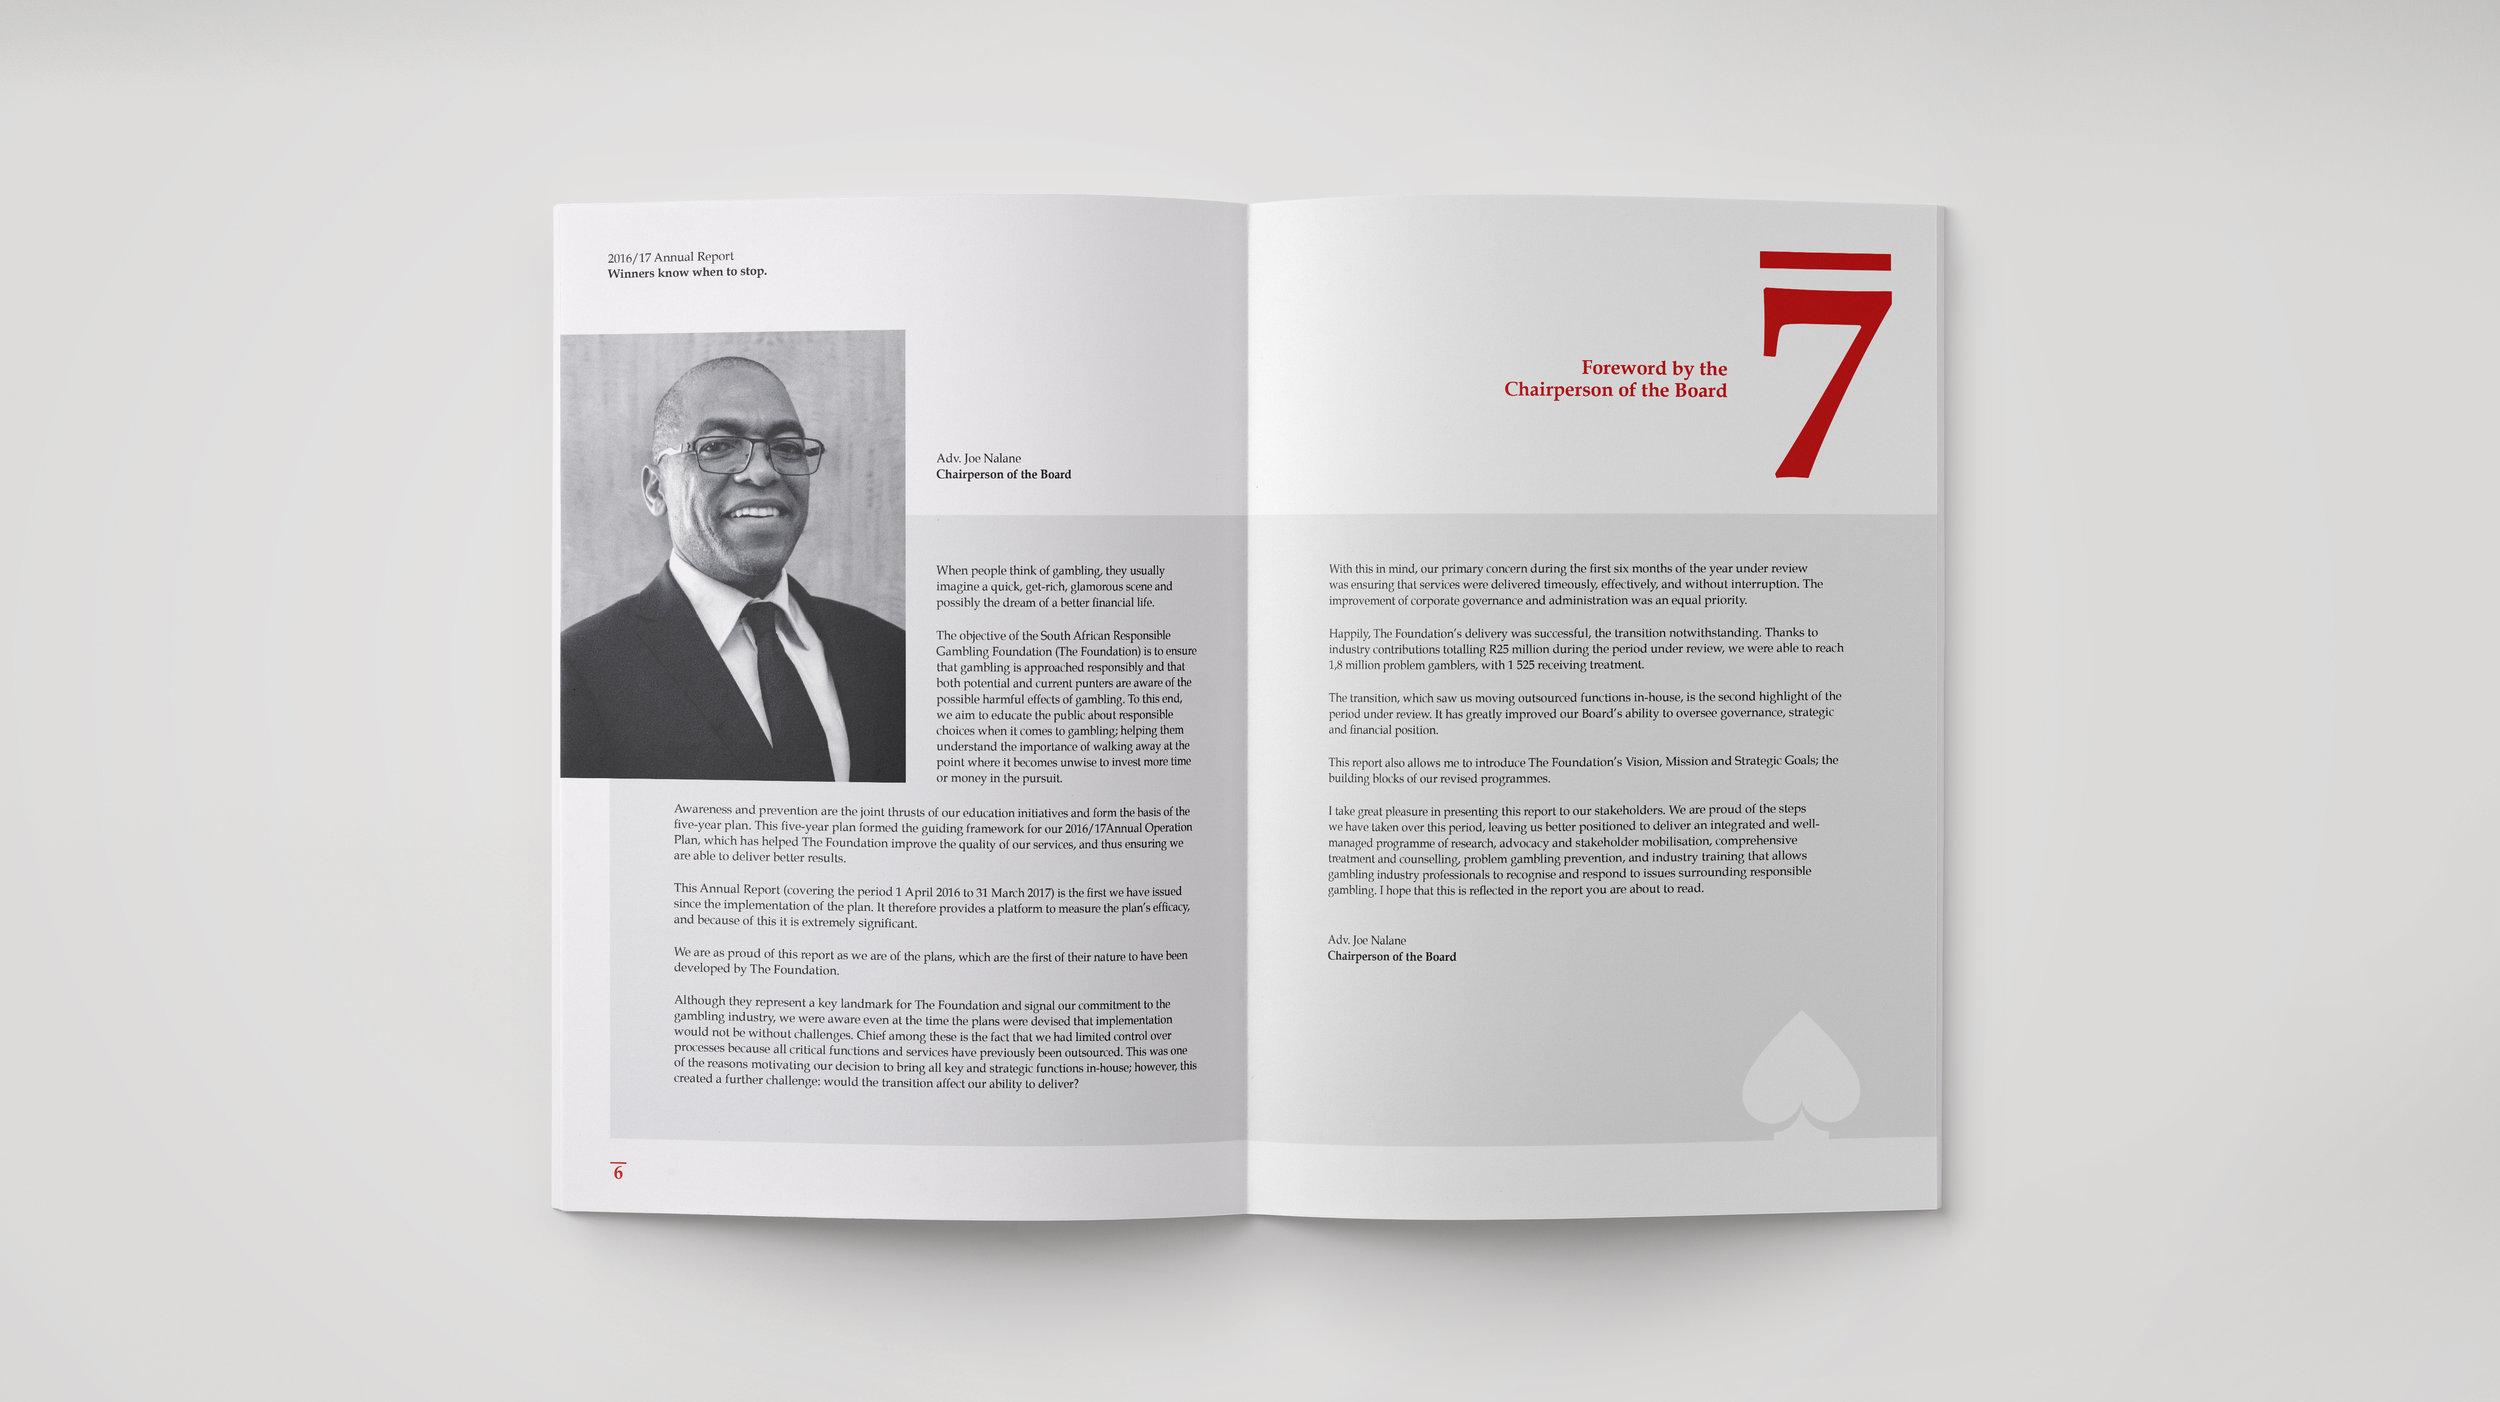 SARGF - Annual Report spread 04.jpg